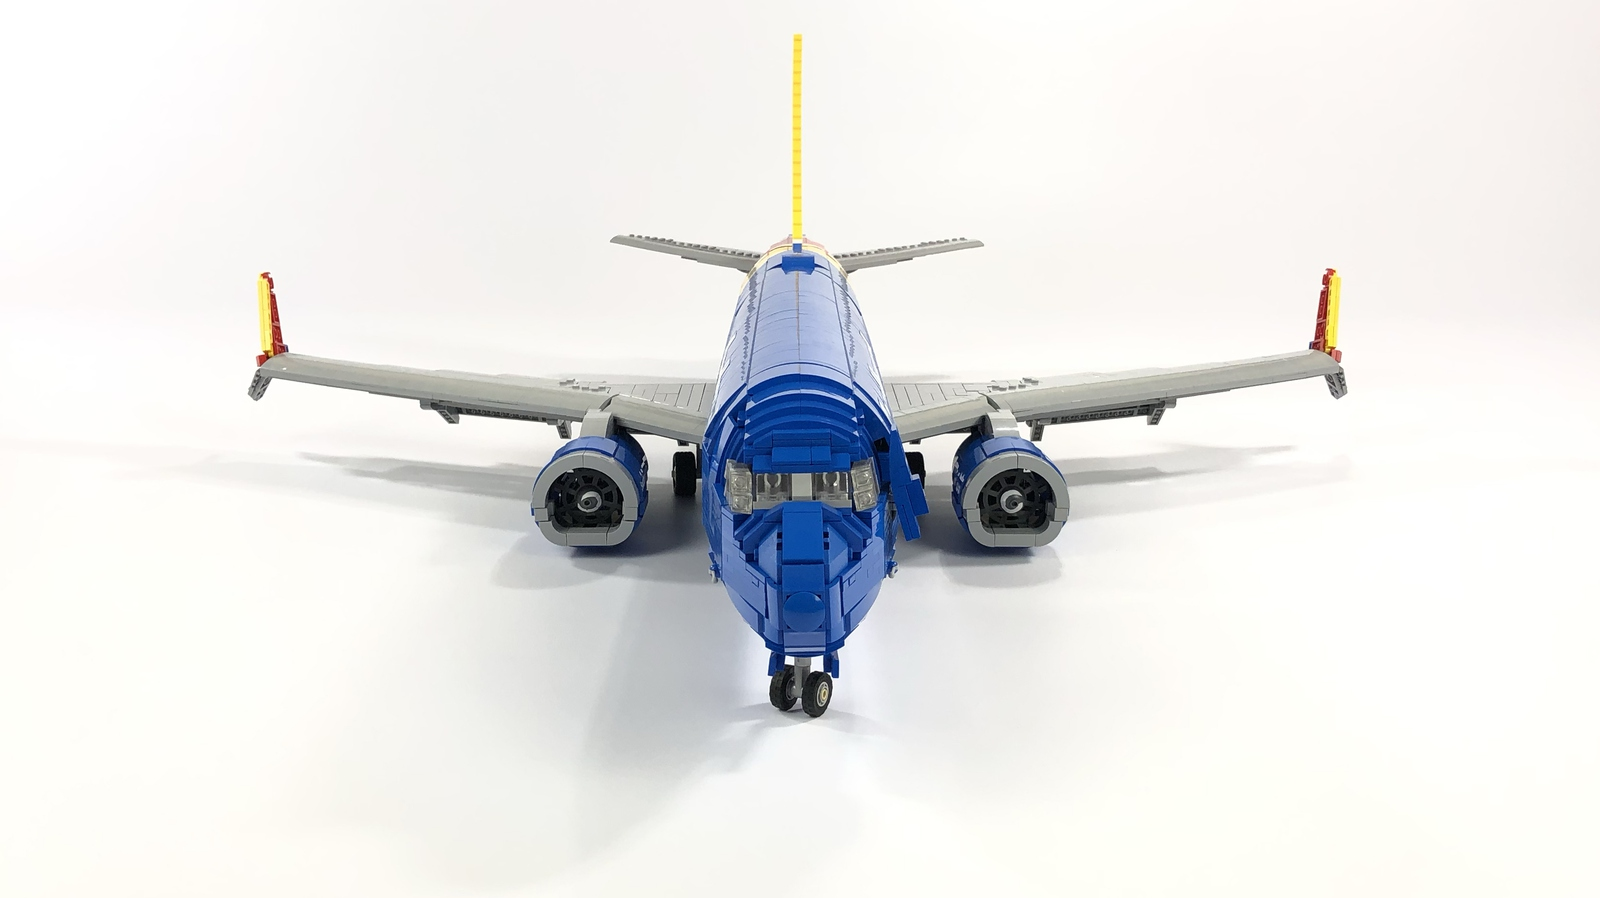 lego-ideas-southwest-737-800-bigplanes-customs-3 zusammengebaut.com